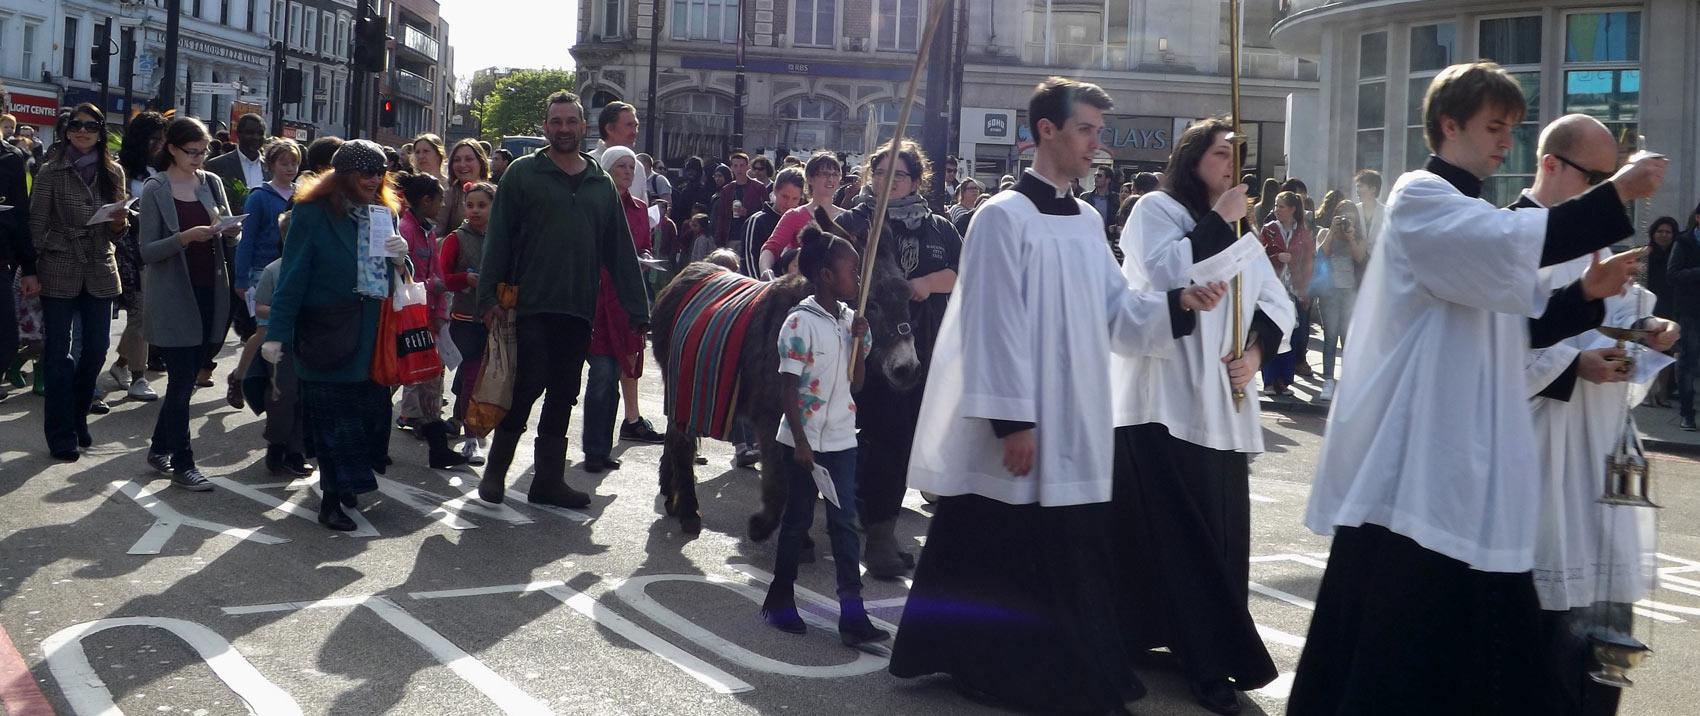 Kings Cross St Pancras Parish